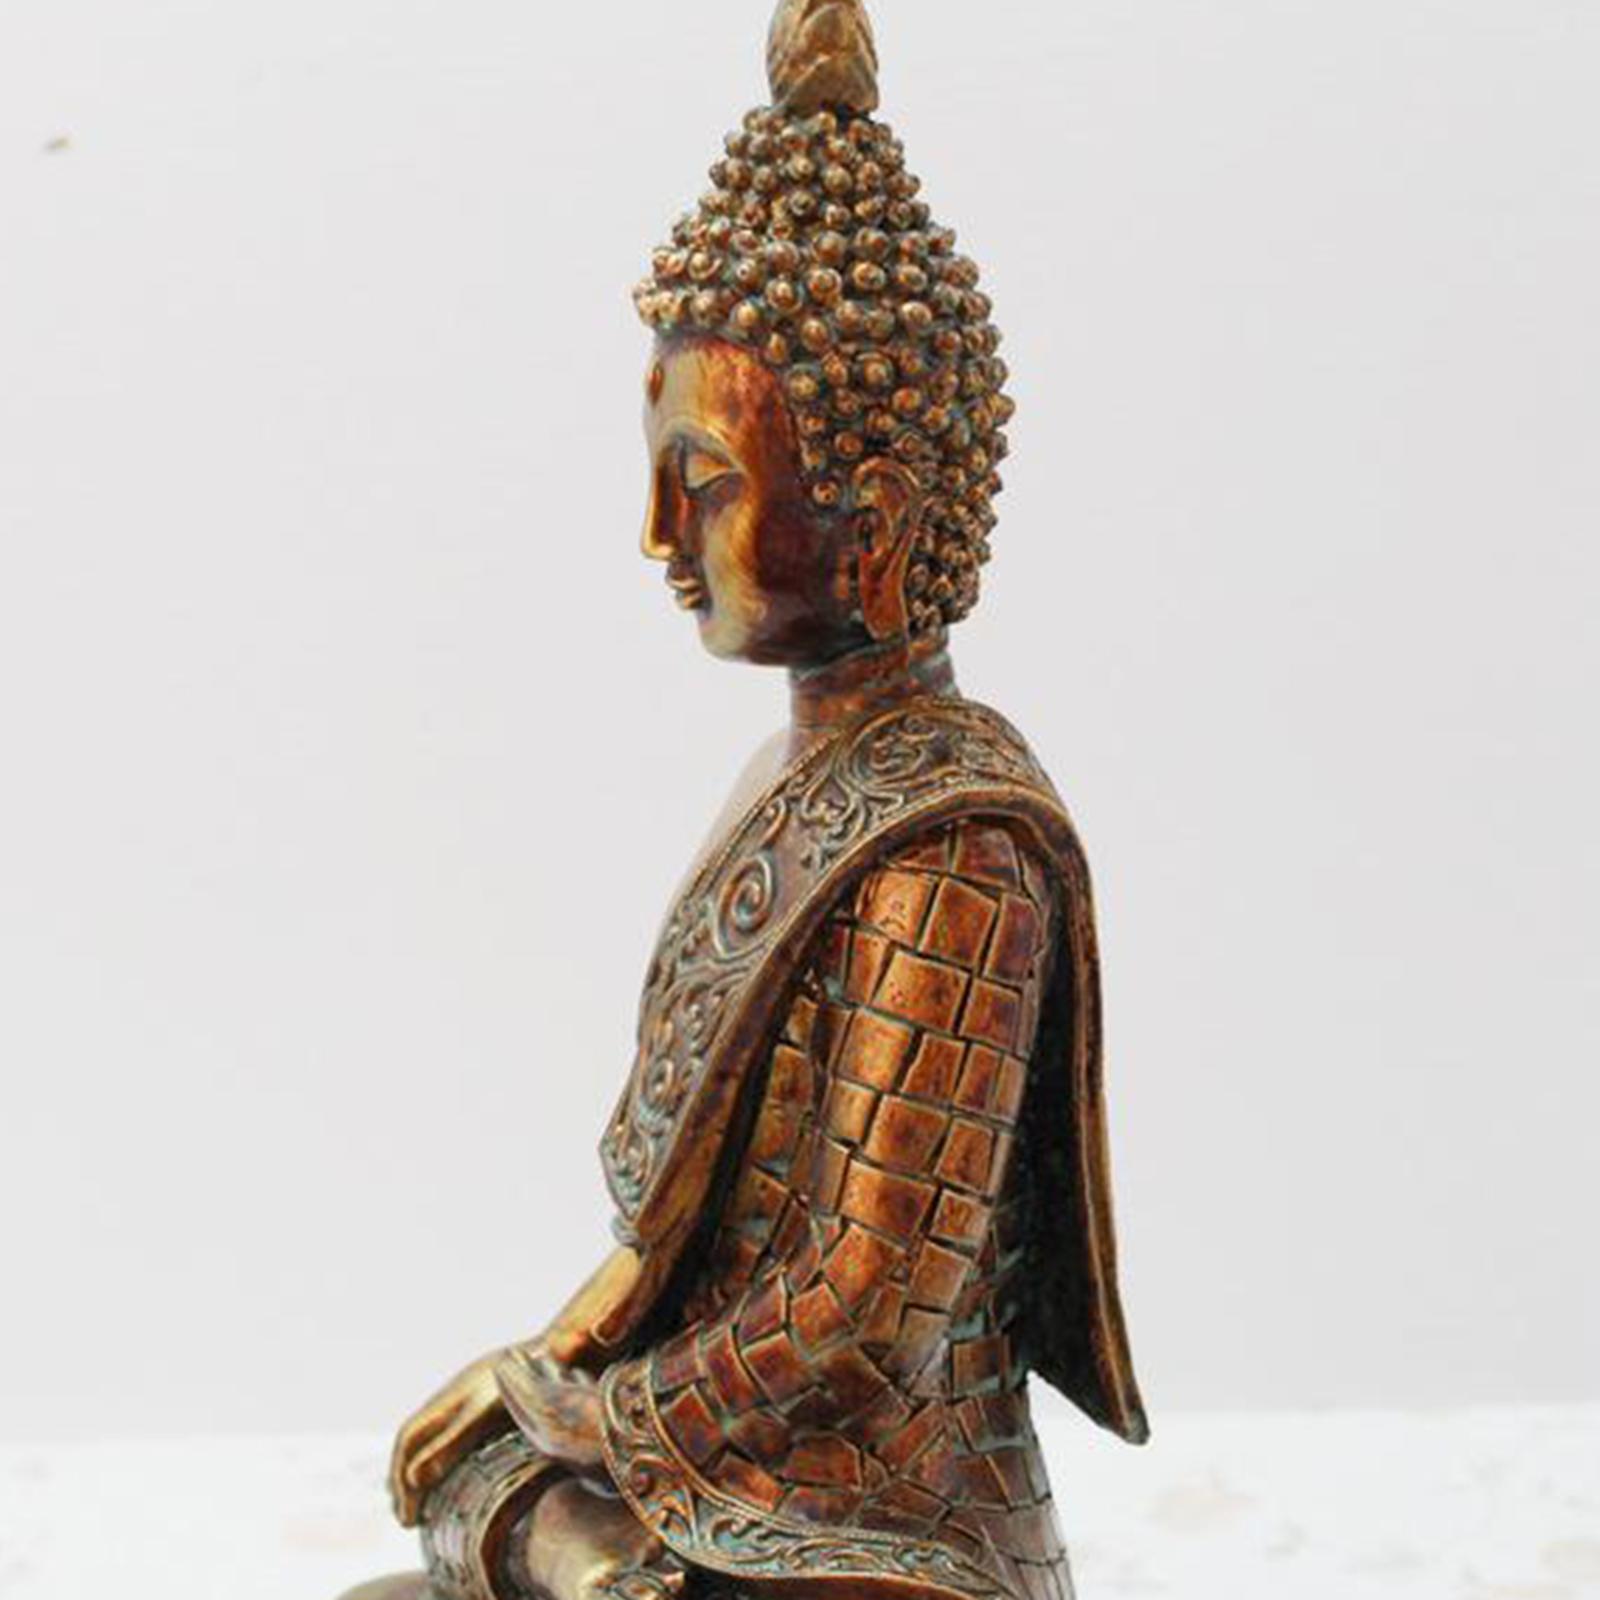 miniatura 5 - Statua di Buddha In Resina Sakyamuni Seduto Buddista Figurine Della